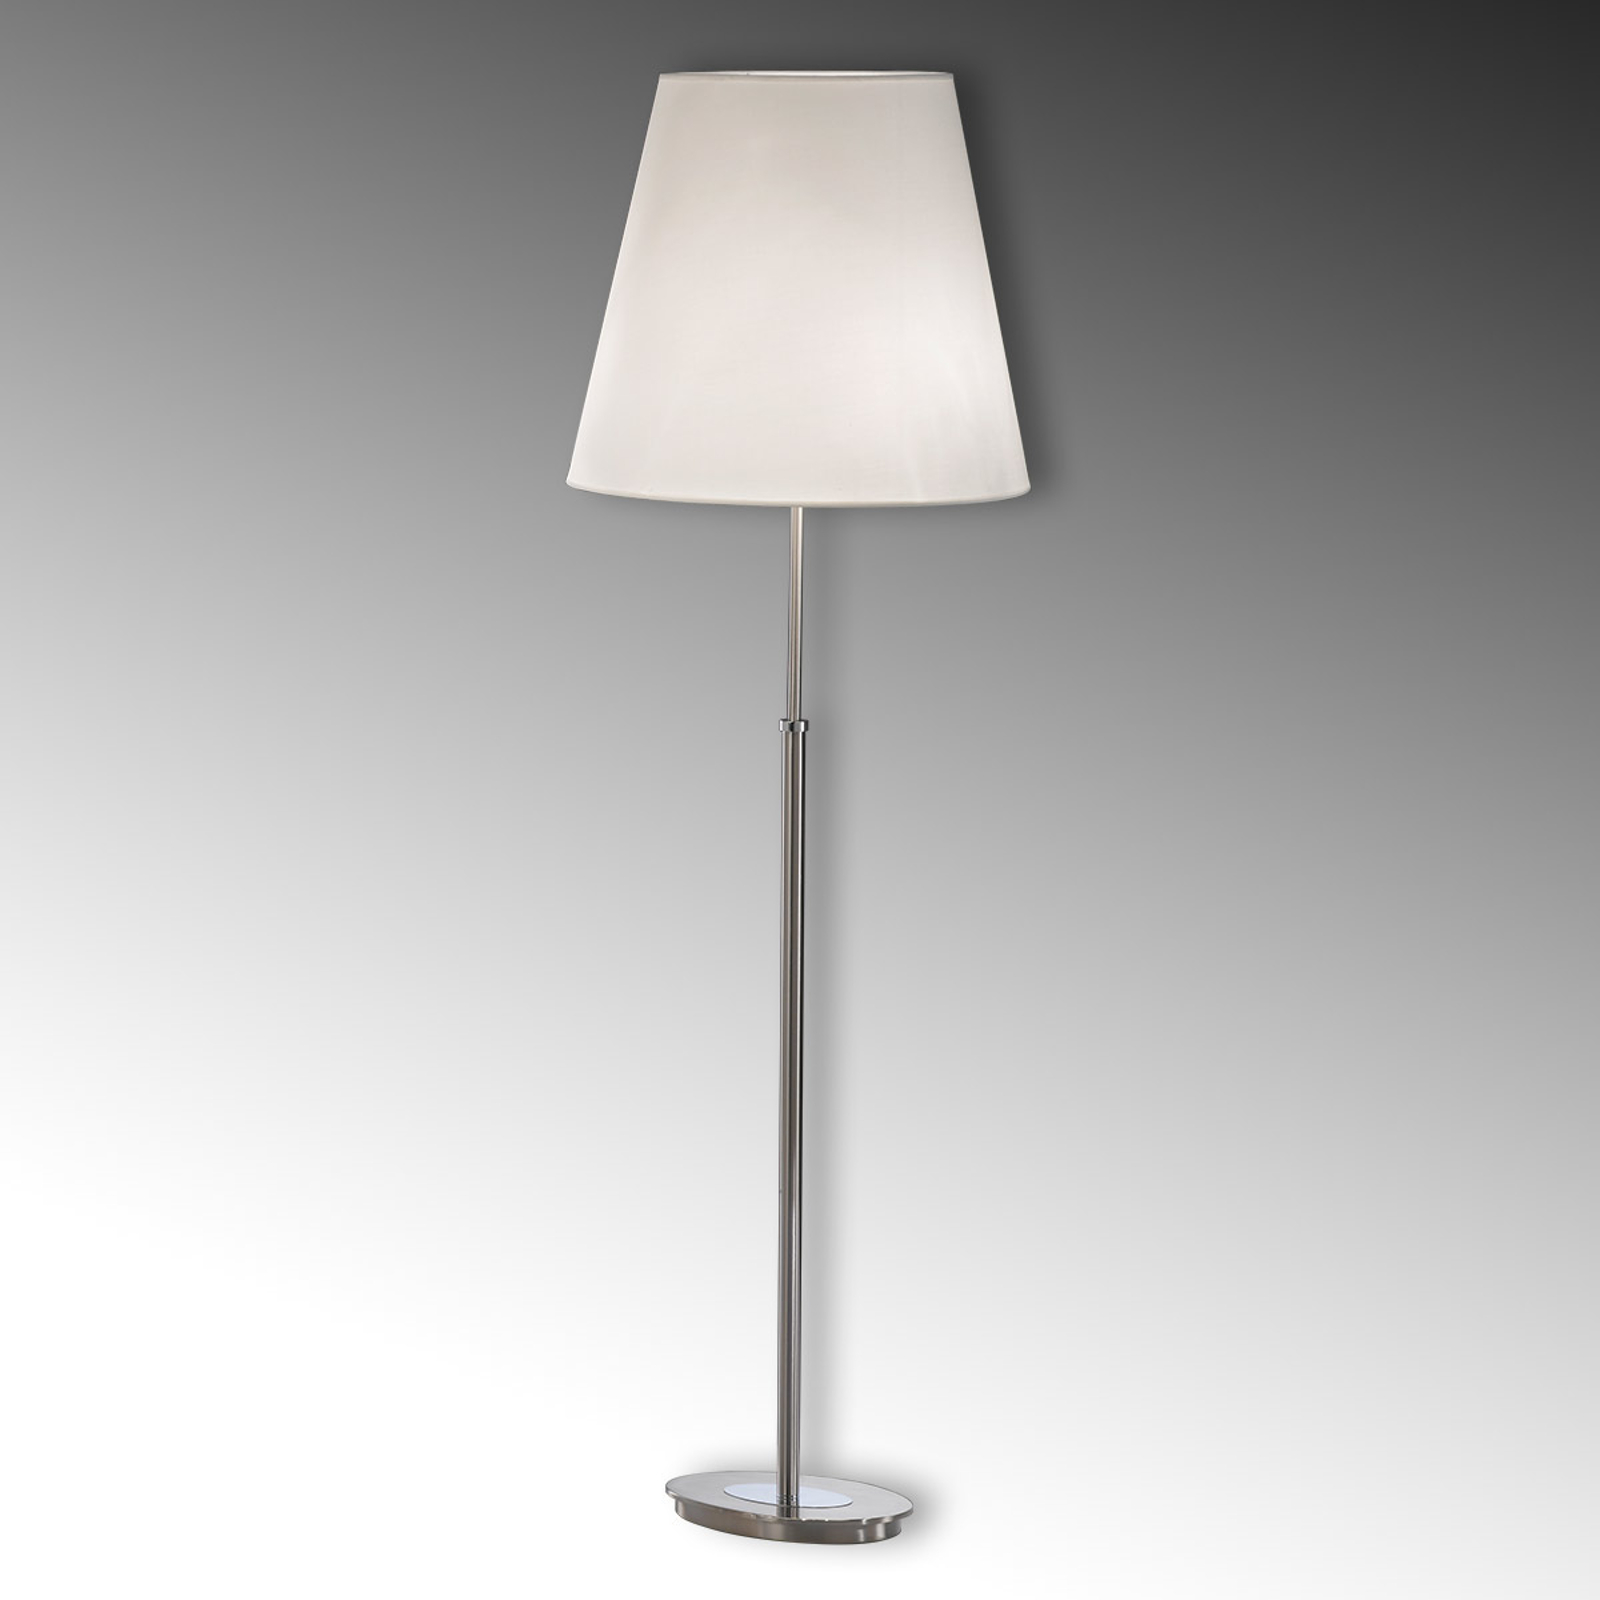 Textiel-vloerlamp Lilly, nikkel